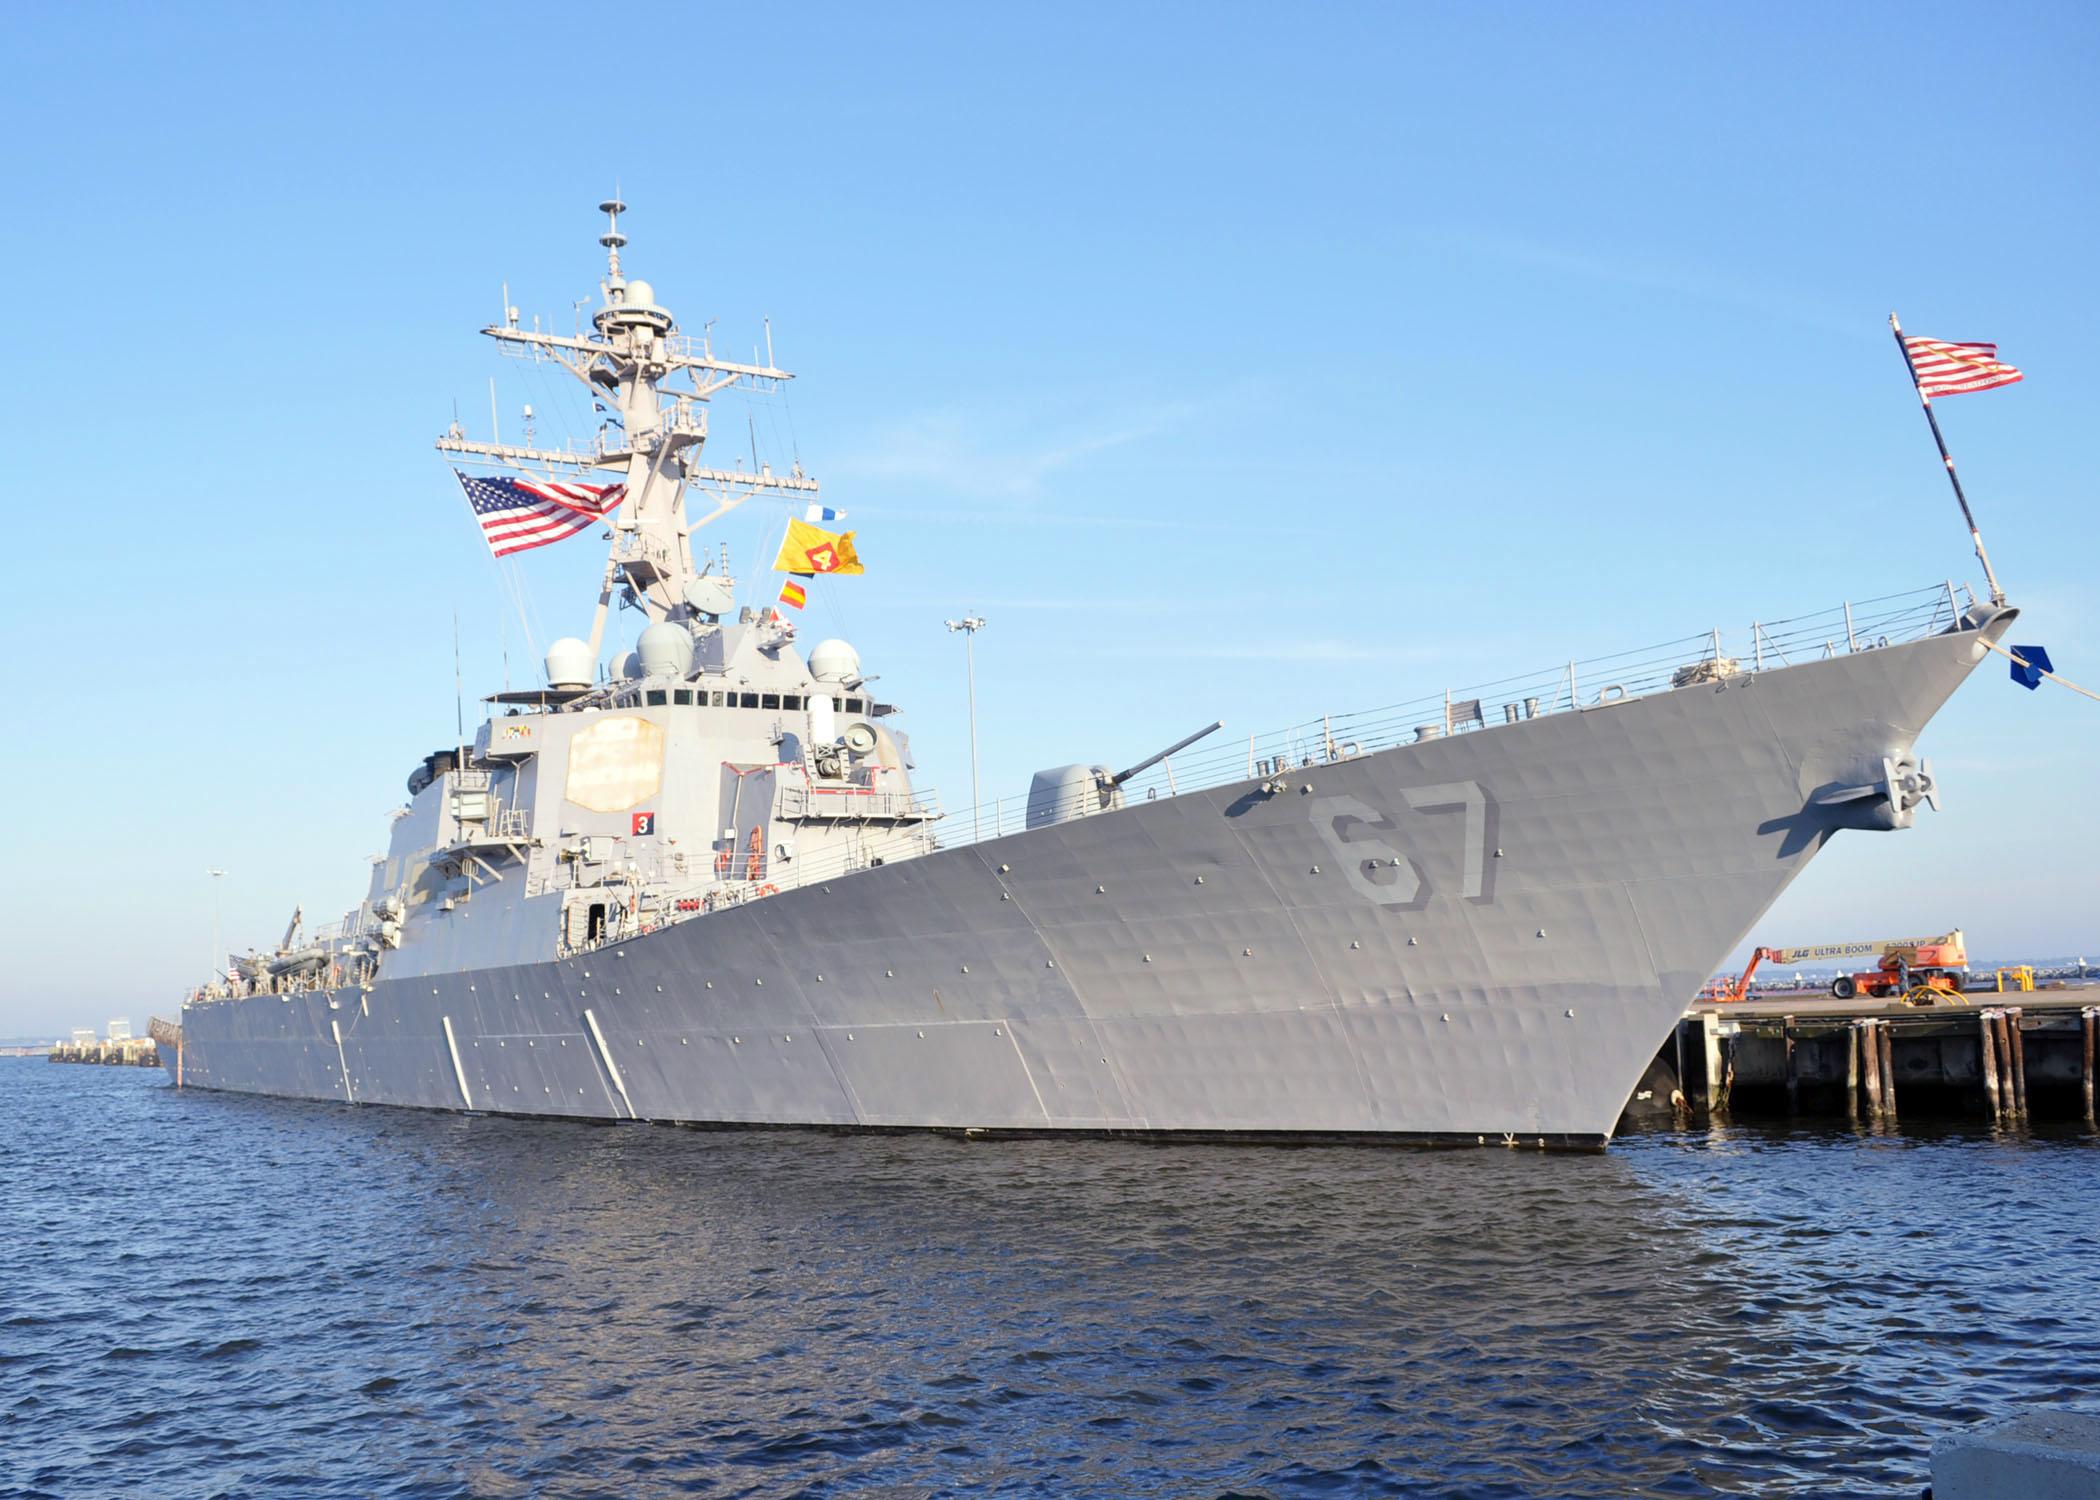 USS COLE DDG-67 Bild: U.S. Navy